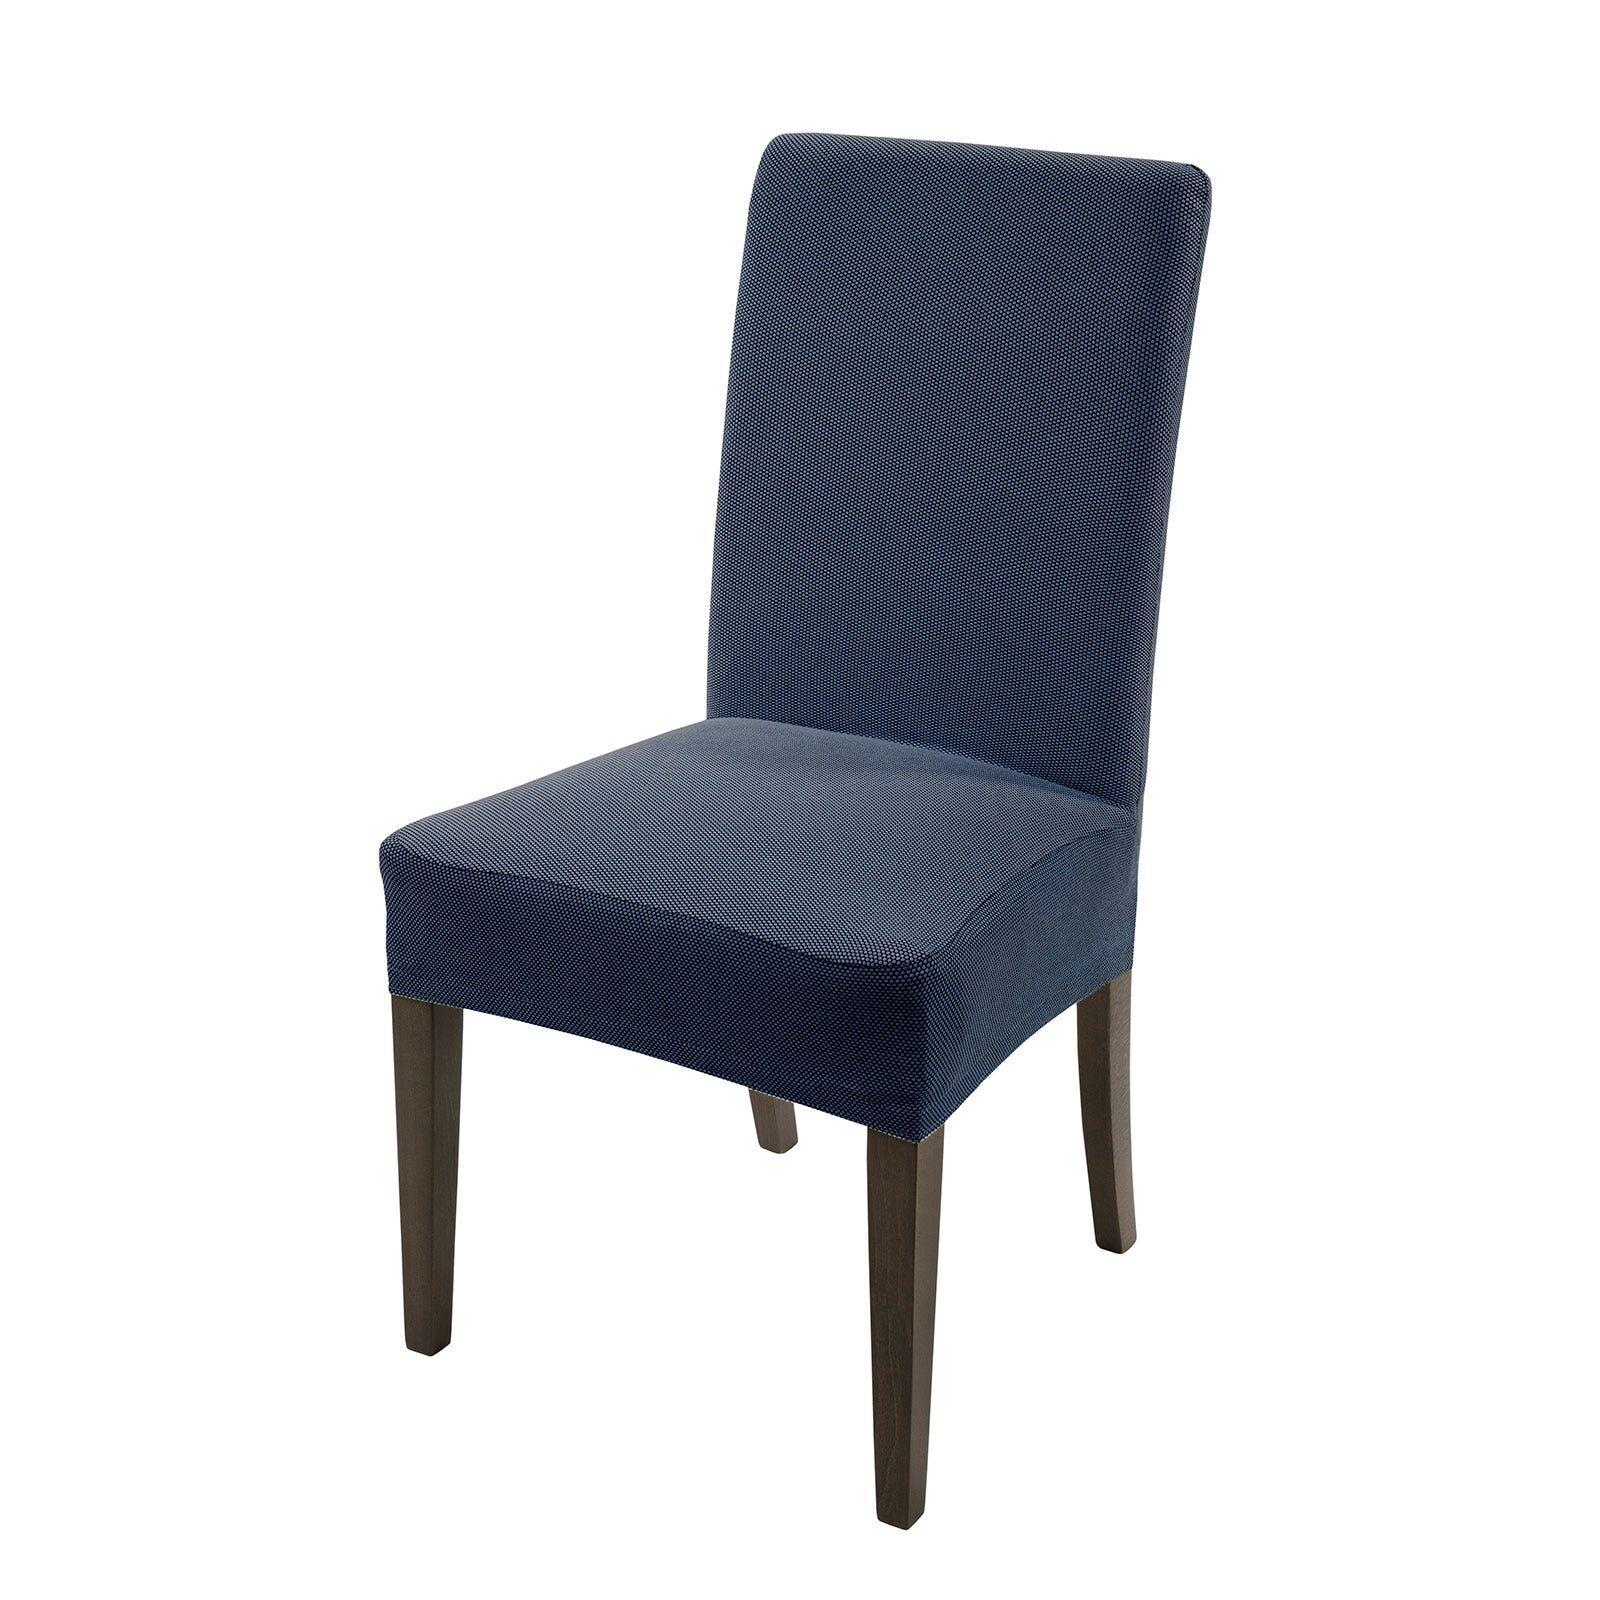 Caleffi Coprisedia Universale Melange 1 Posti Blu per sedie cucina e salotto